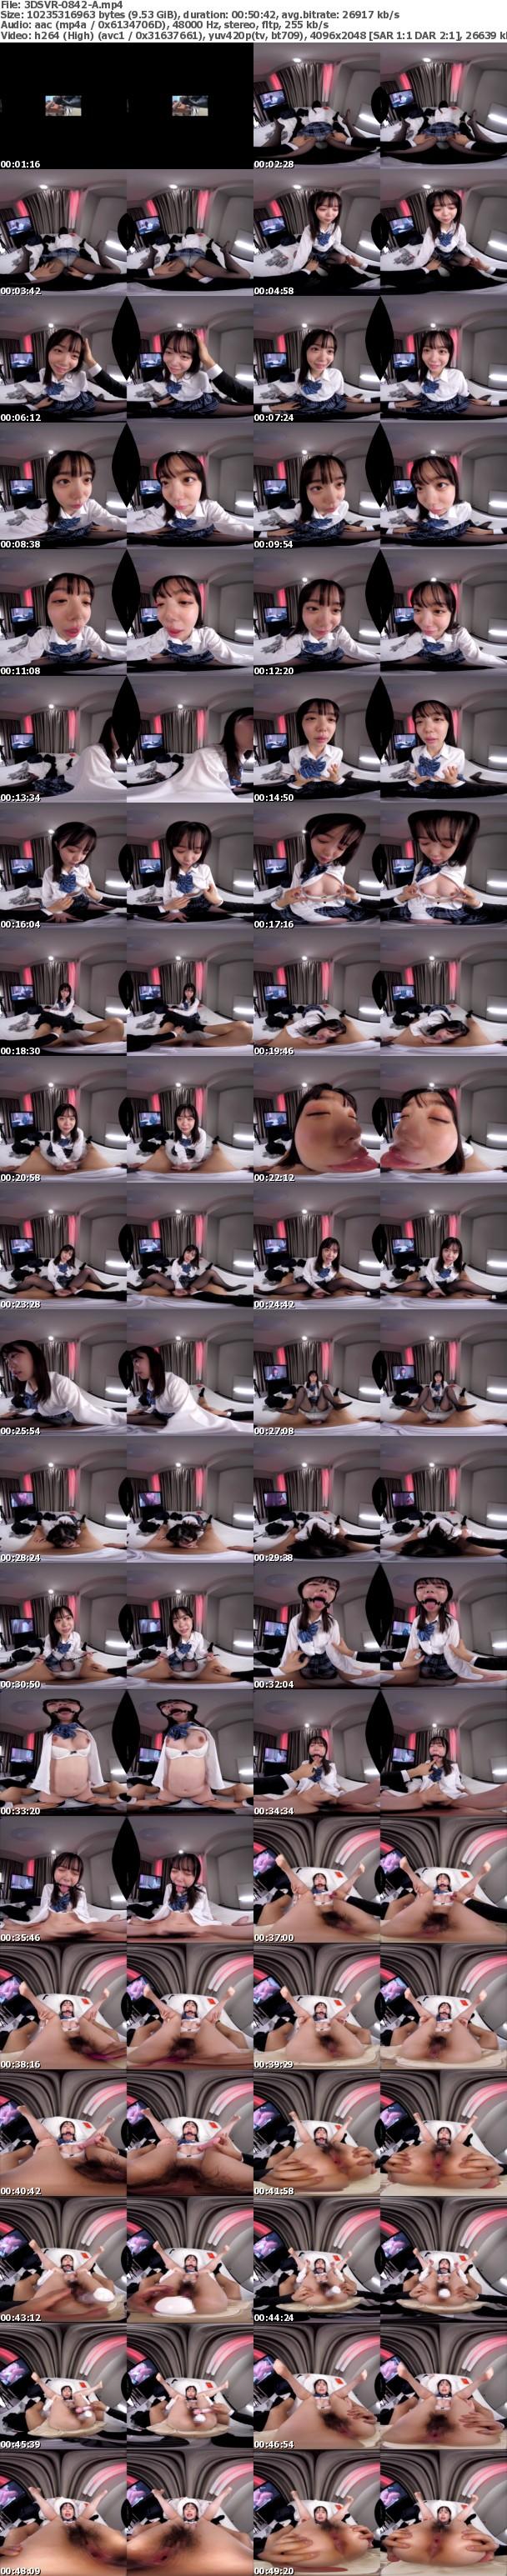 (VR) 3DSVR-0842 3年D組 ヤリマン百瀬さん 受験終わりにラブホで初中出し 百瀬あすか